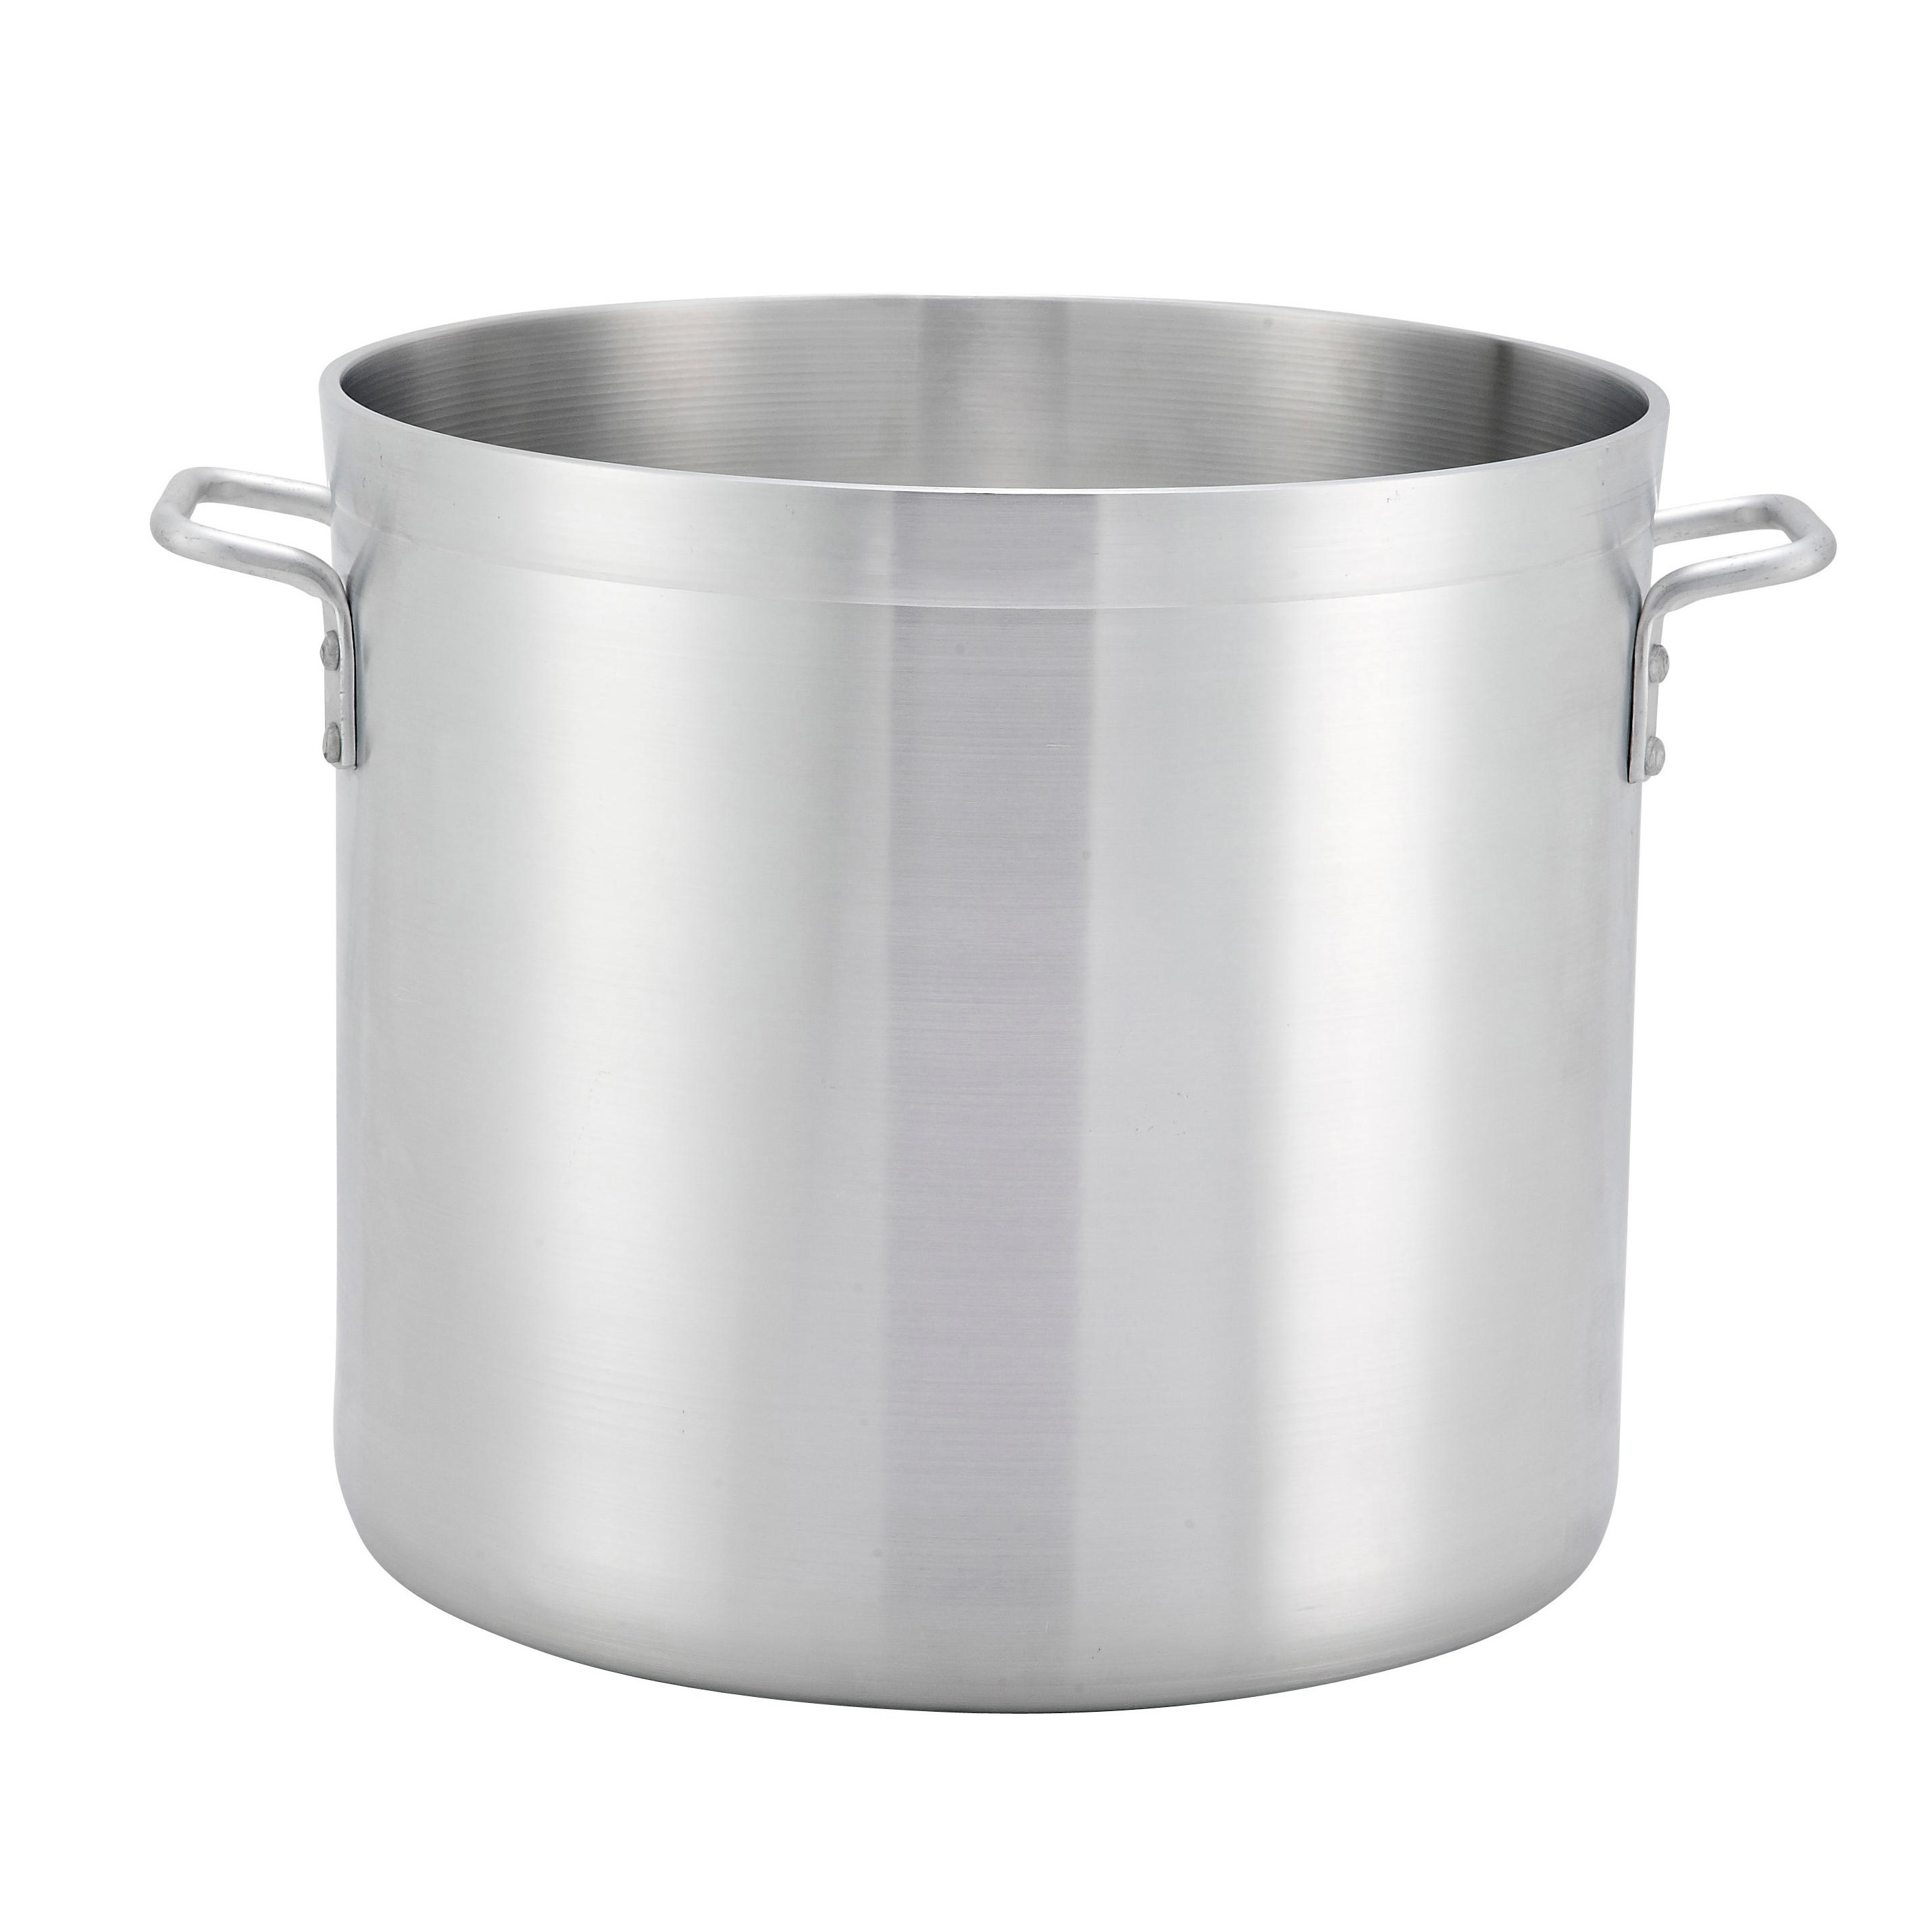 Winco ALHP-160 stock pot